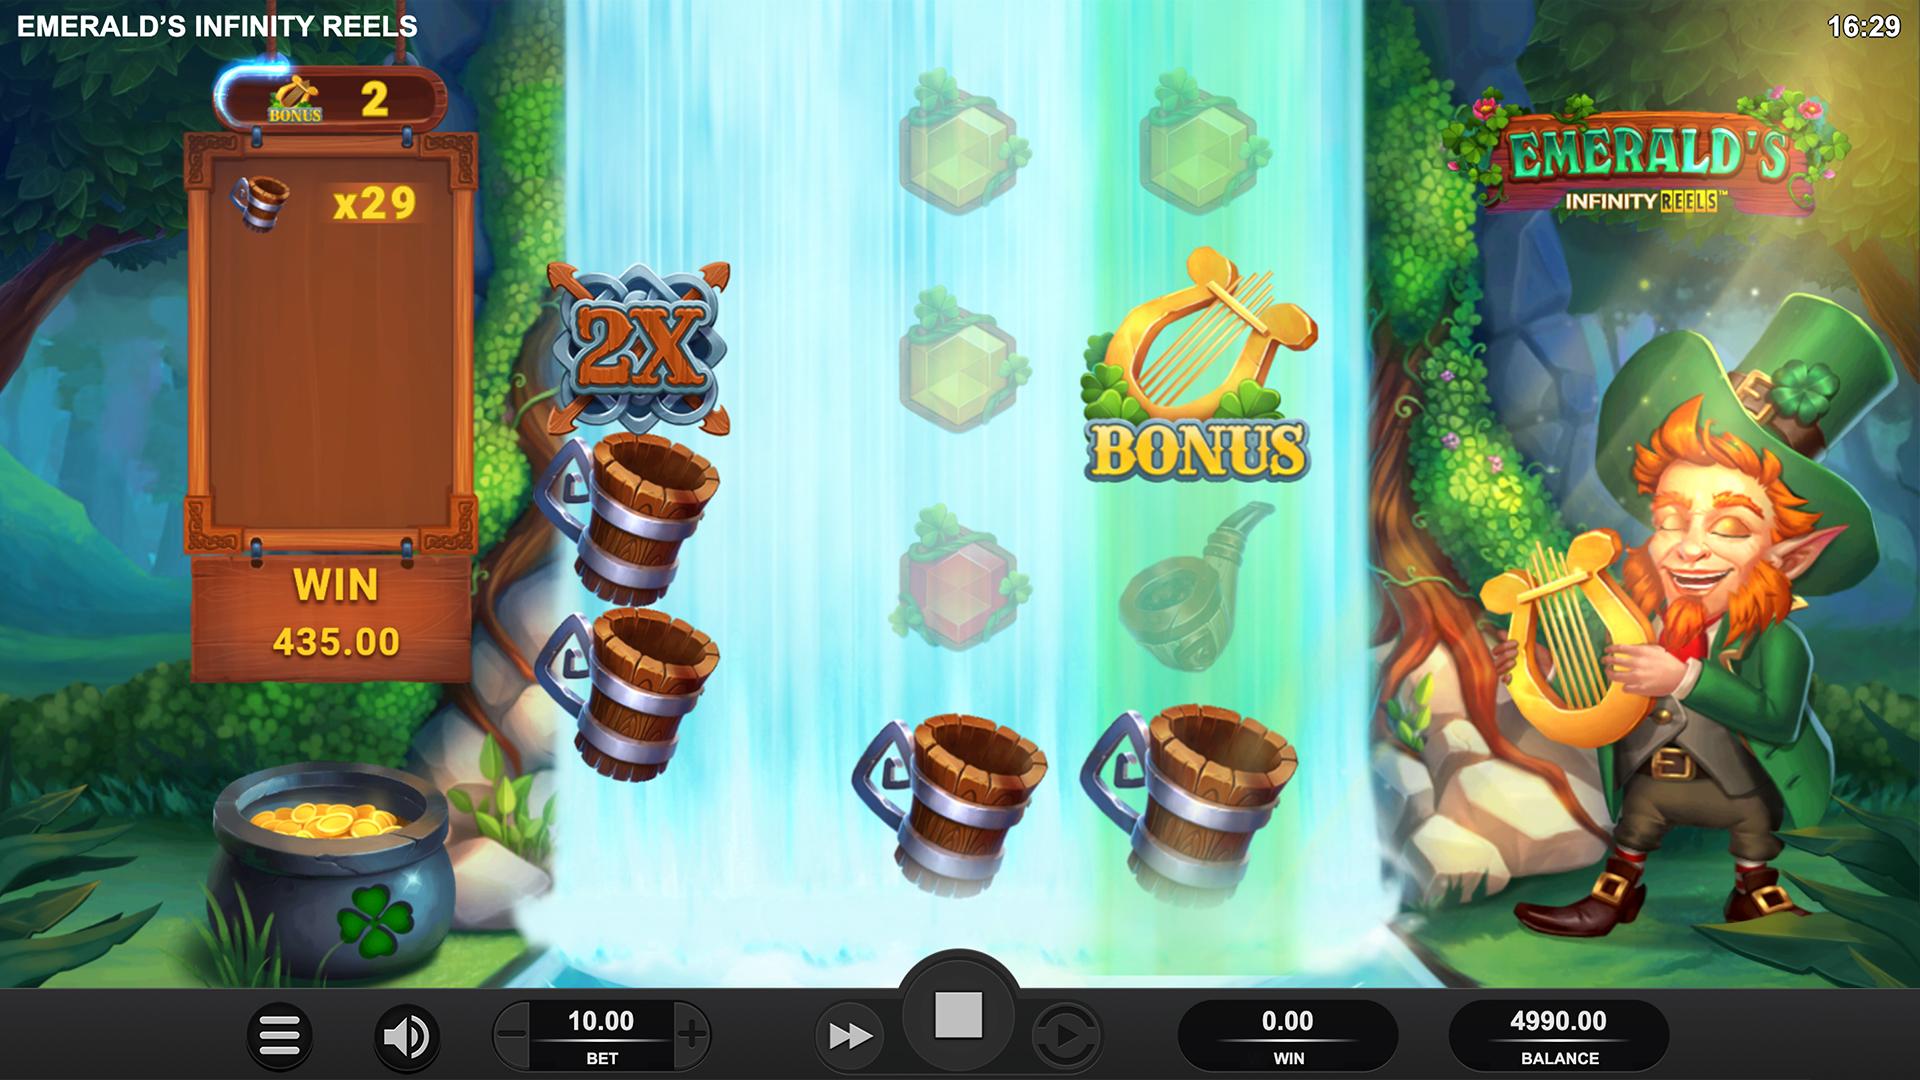 Emerald's Infinity Reels Screenshot